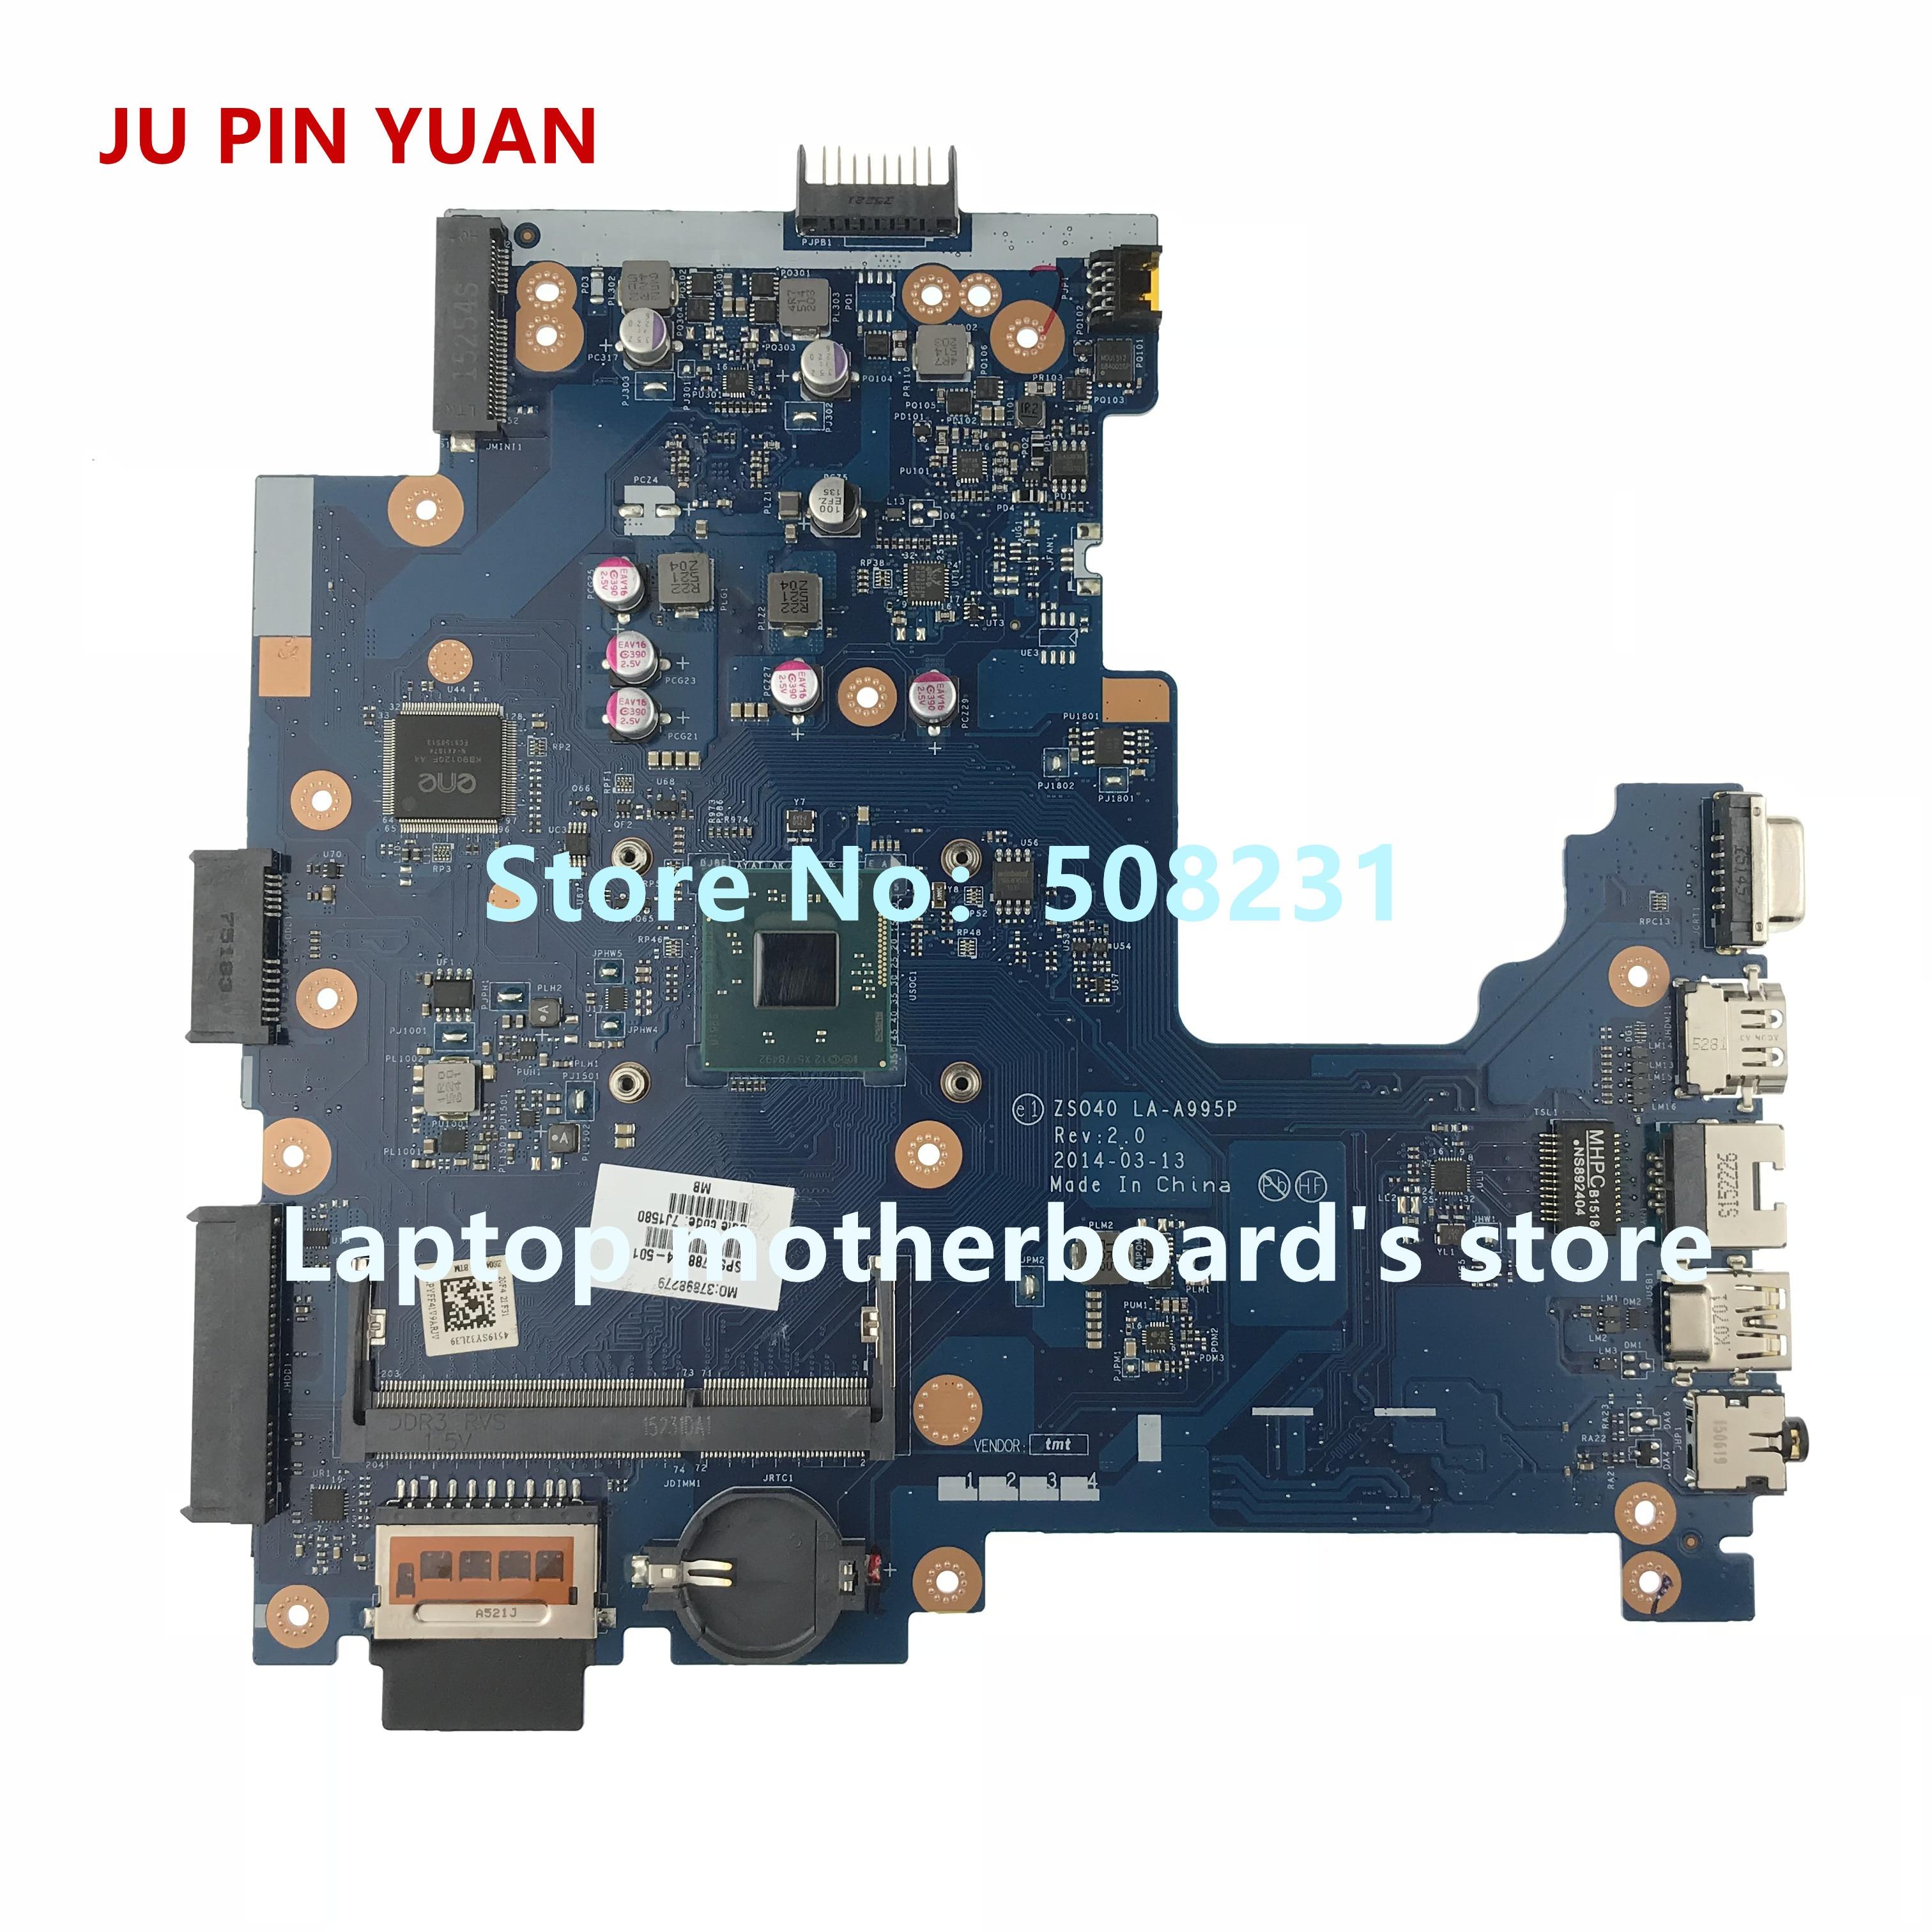 JU PIN YUAN 788004-001 788004-501 mainboard For HP 14-R 240 G3 Notebook PC  ZSO40 LA-A995P Laptop Motherboard fully TestedJU PIN YUAN 788004-001 788004-501 mainboard For HP 14-R 240 G3 Notebook PC  ZSO40 LA-A995P Laptop Motherboard fully Tested